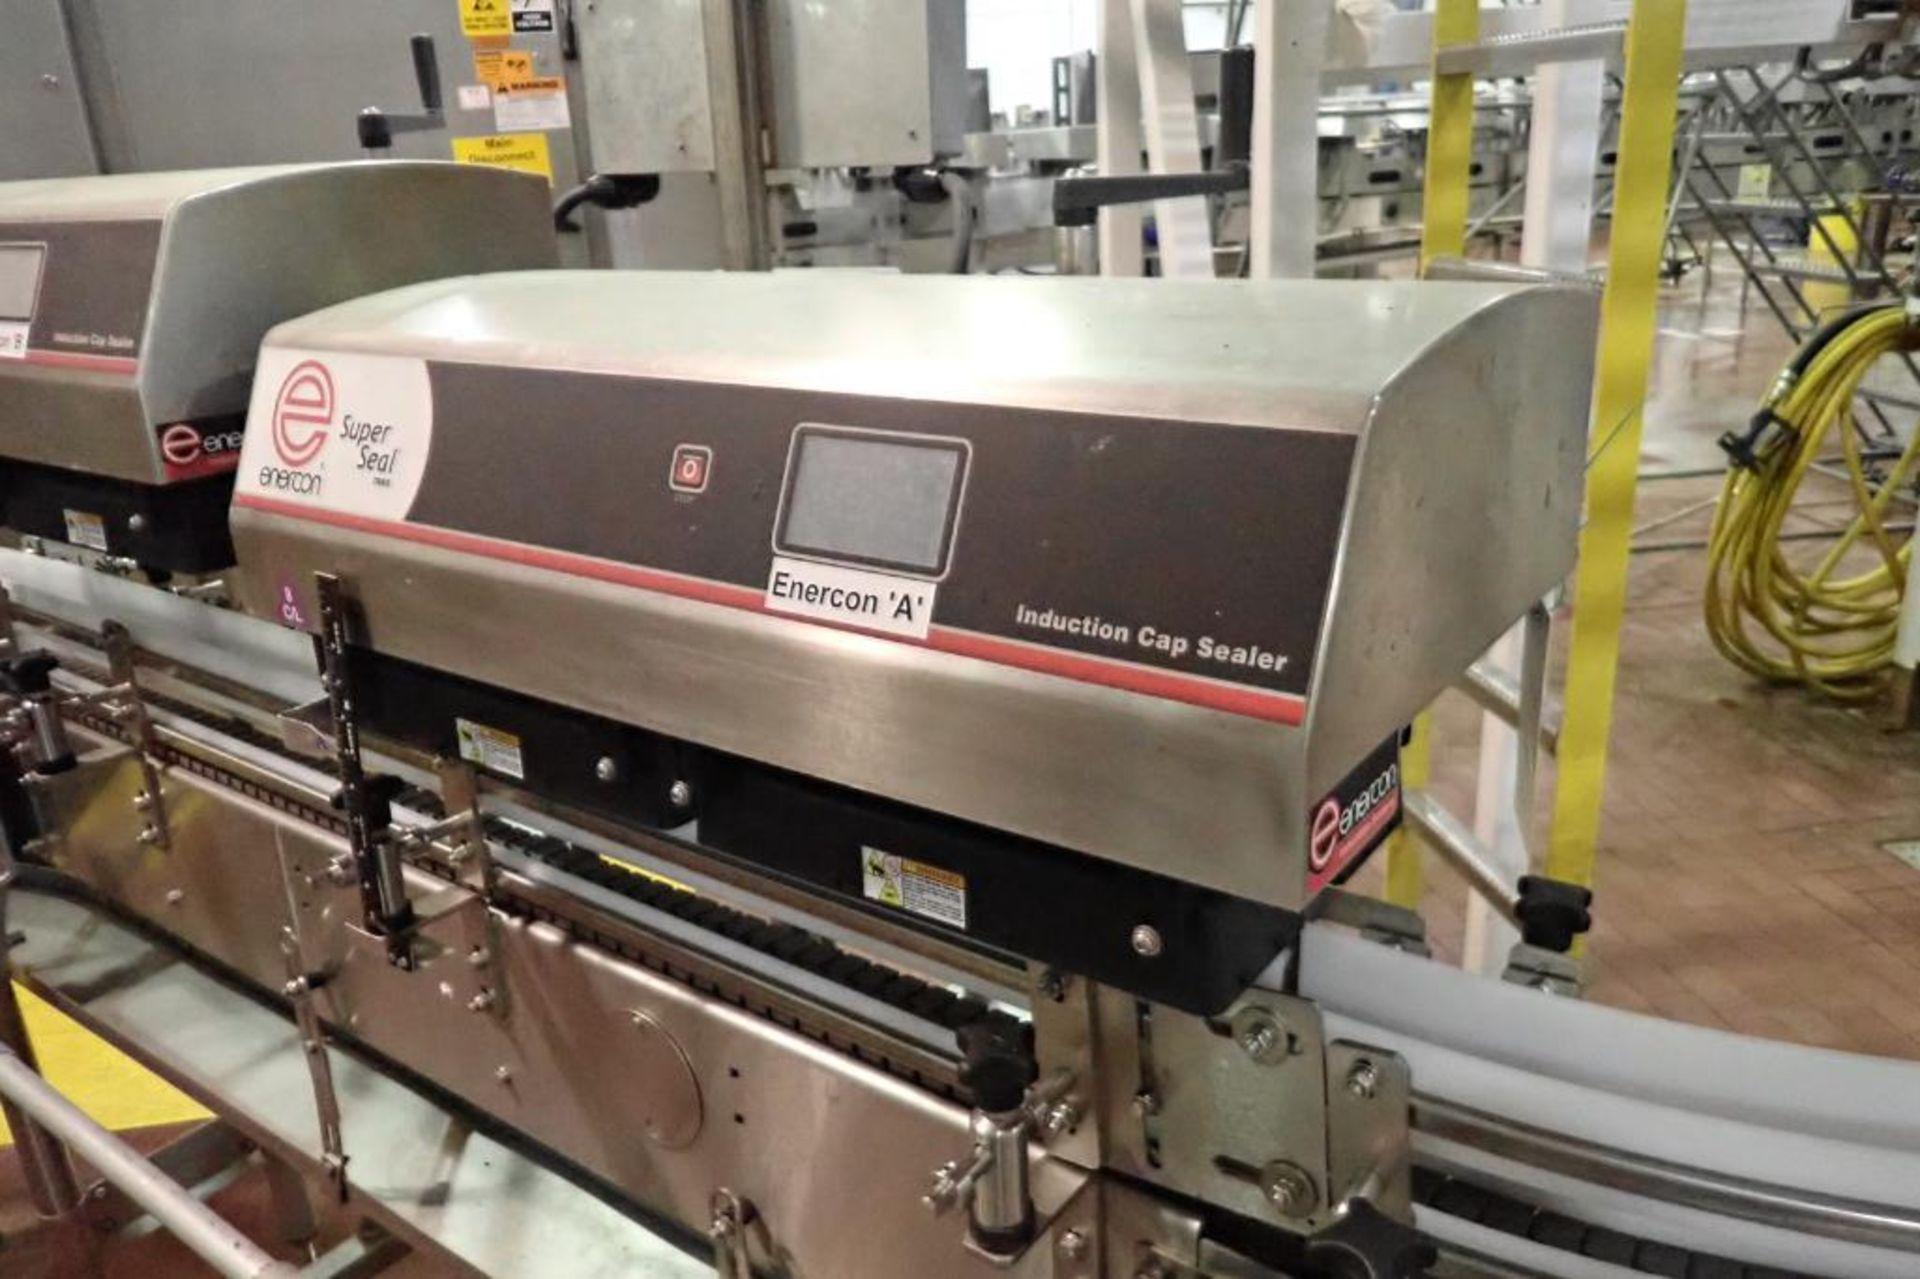 Lot 125 - Enerconsuper seal max induction cap sealer - (Located in Newport, TN)